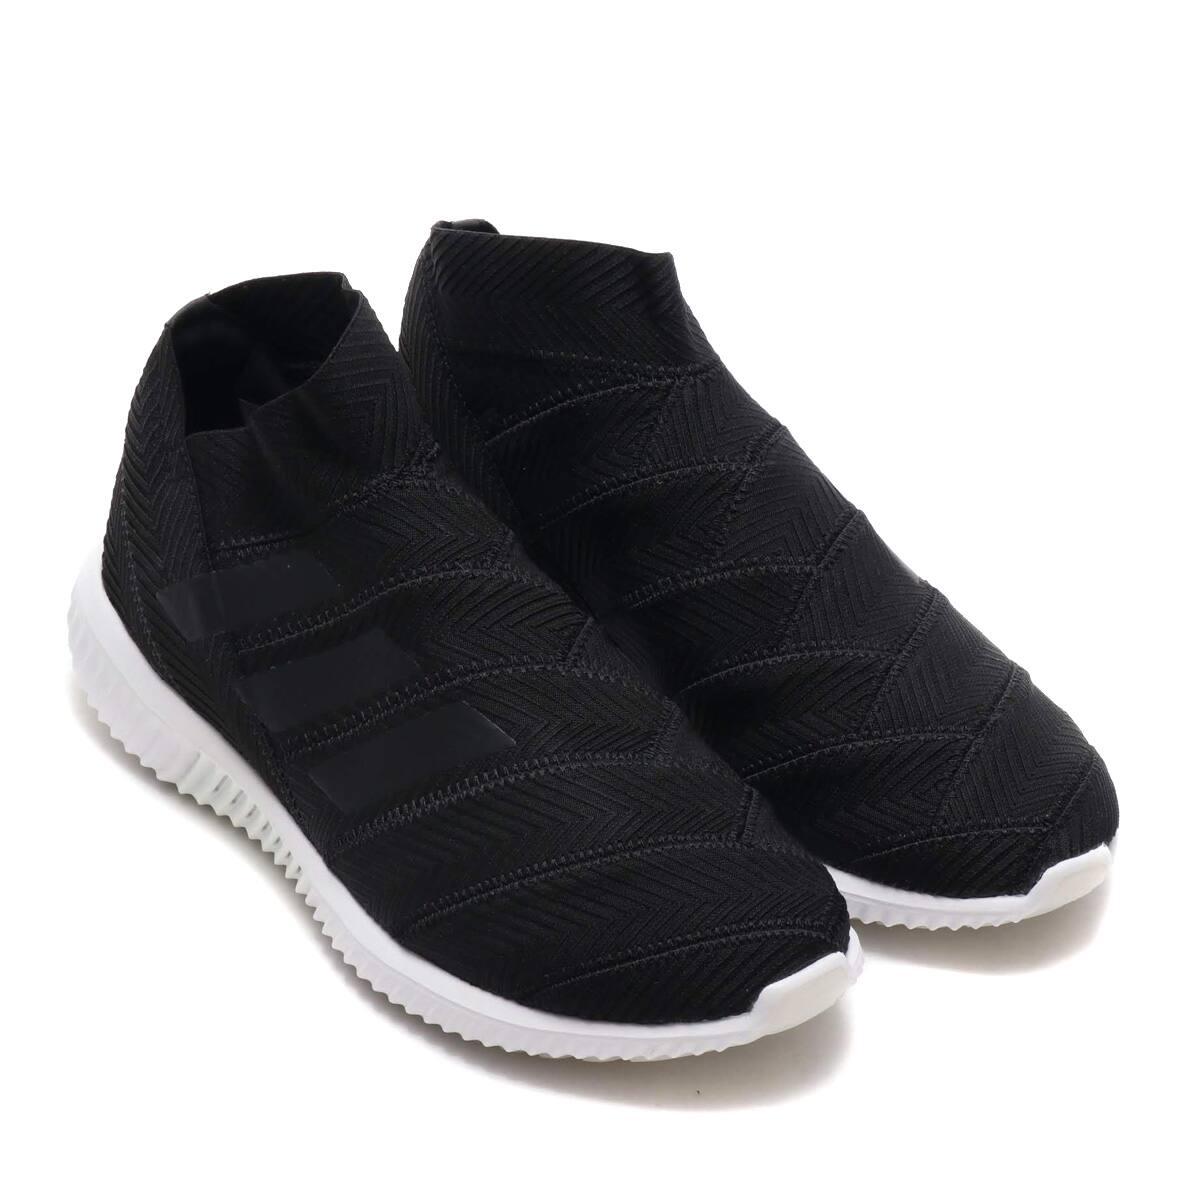 f5a04febf adidas NEMEZIZ TANGO 18.1 TR CORE BLACK/CORE BLACK/RUNNING WHITE